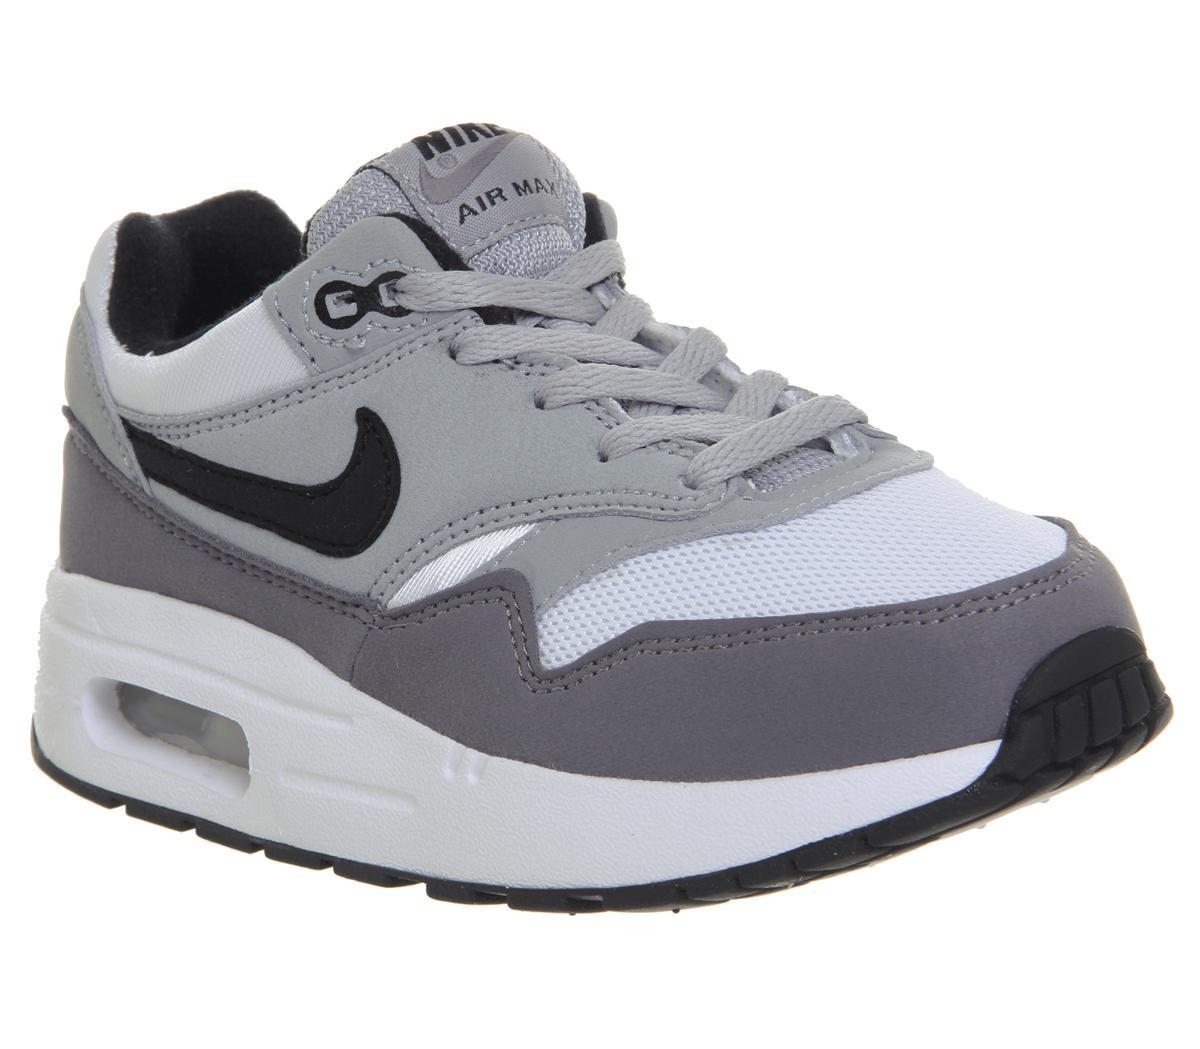 Nike Air Max 1 Ps White Black Wolf Grey